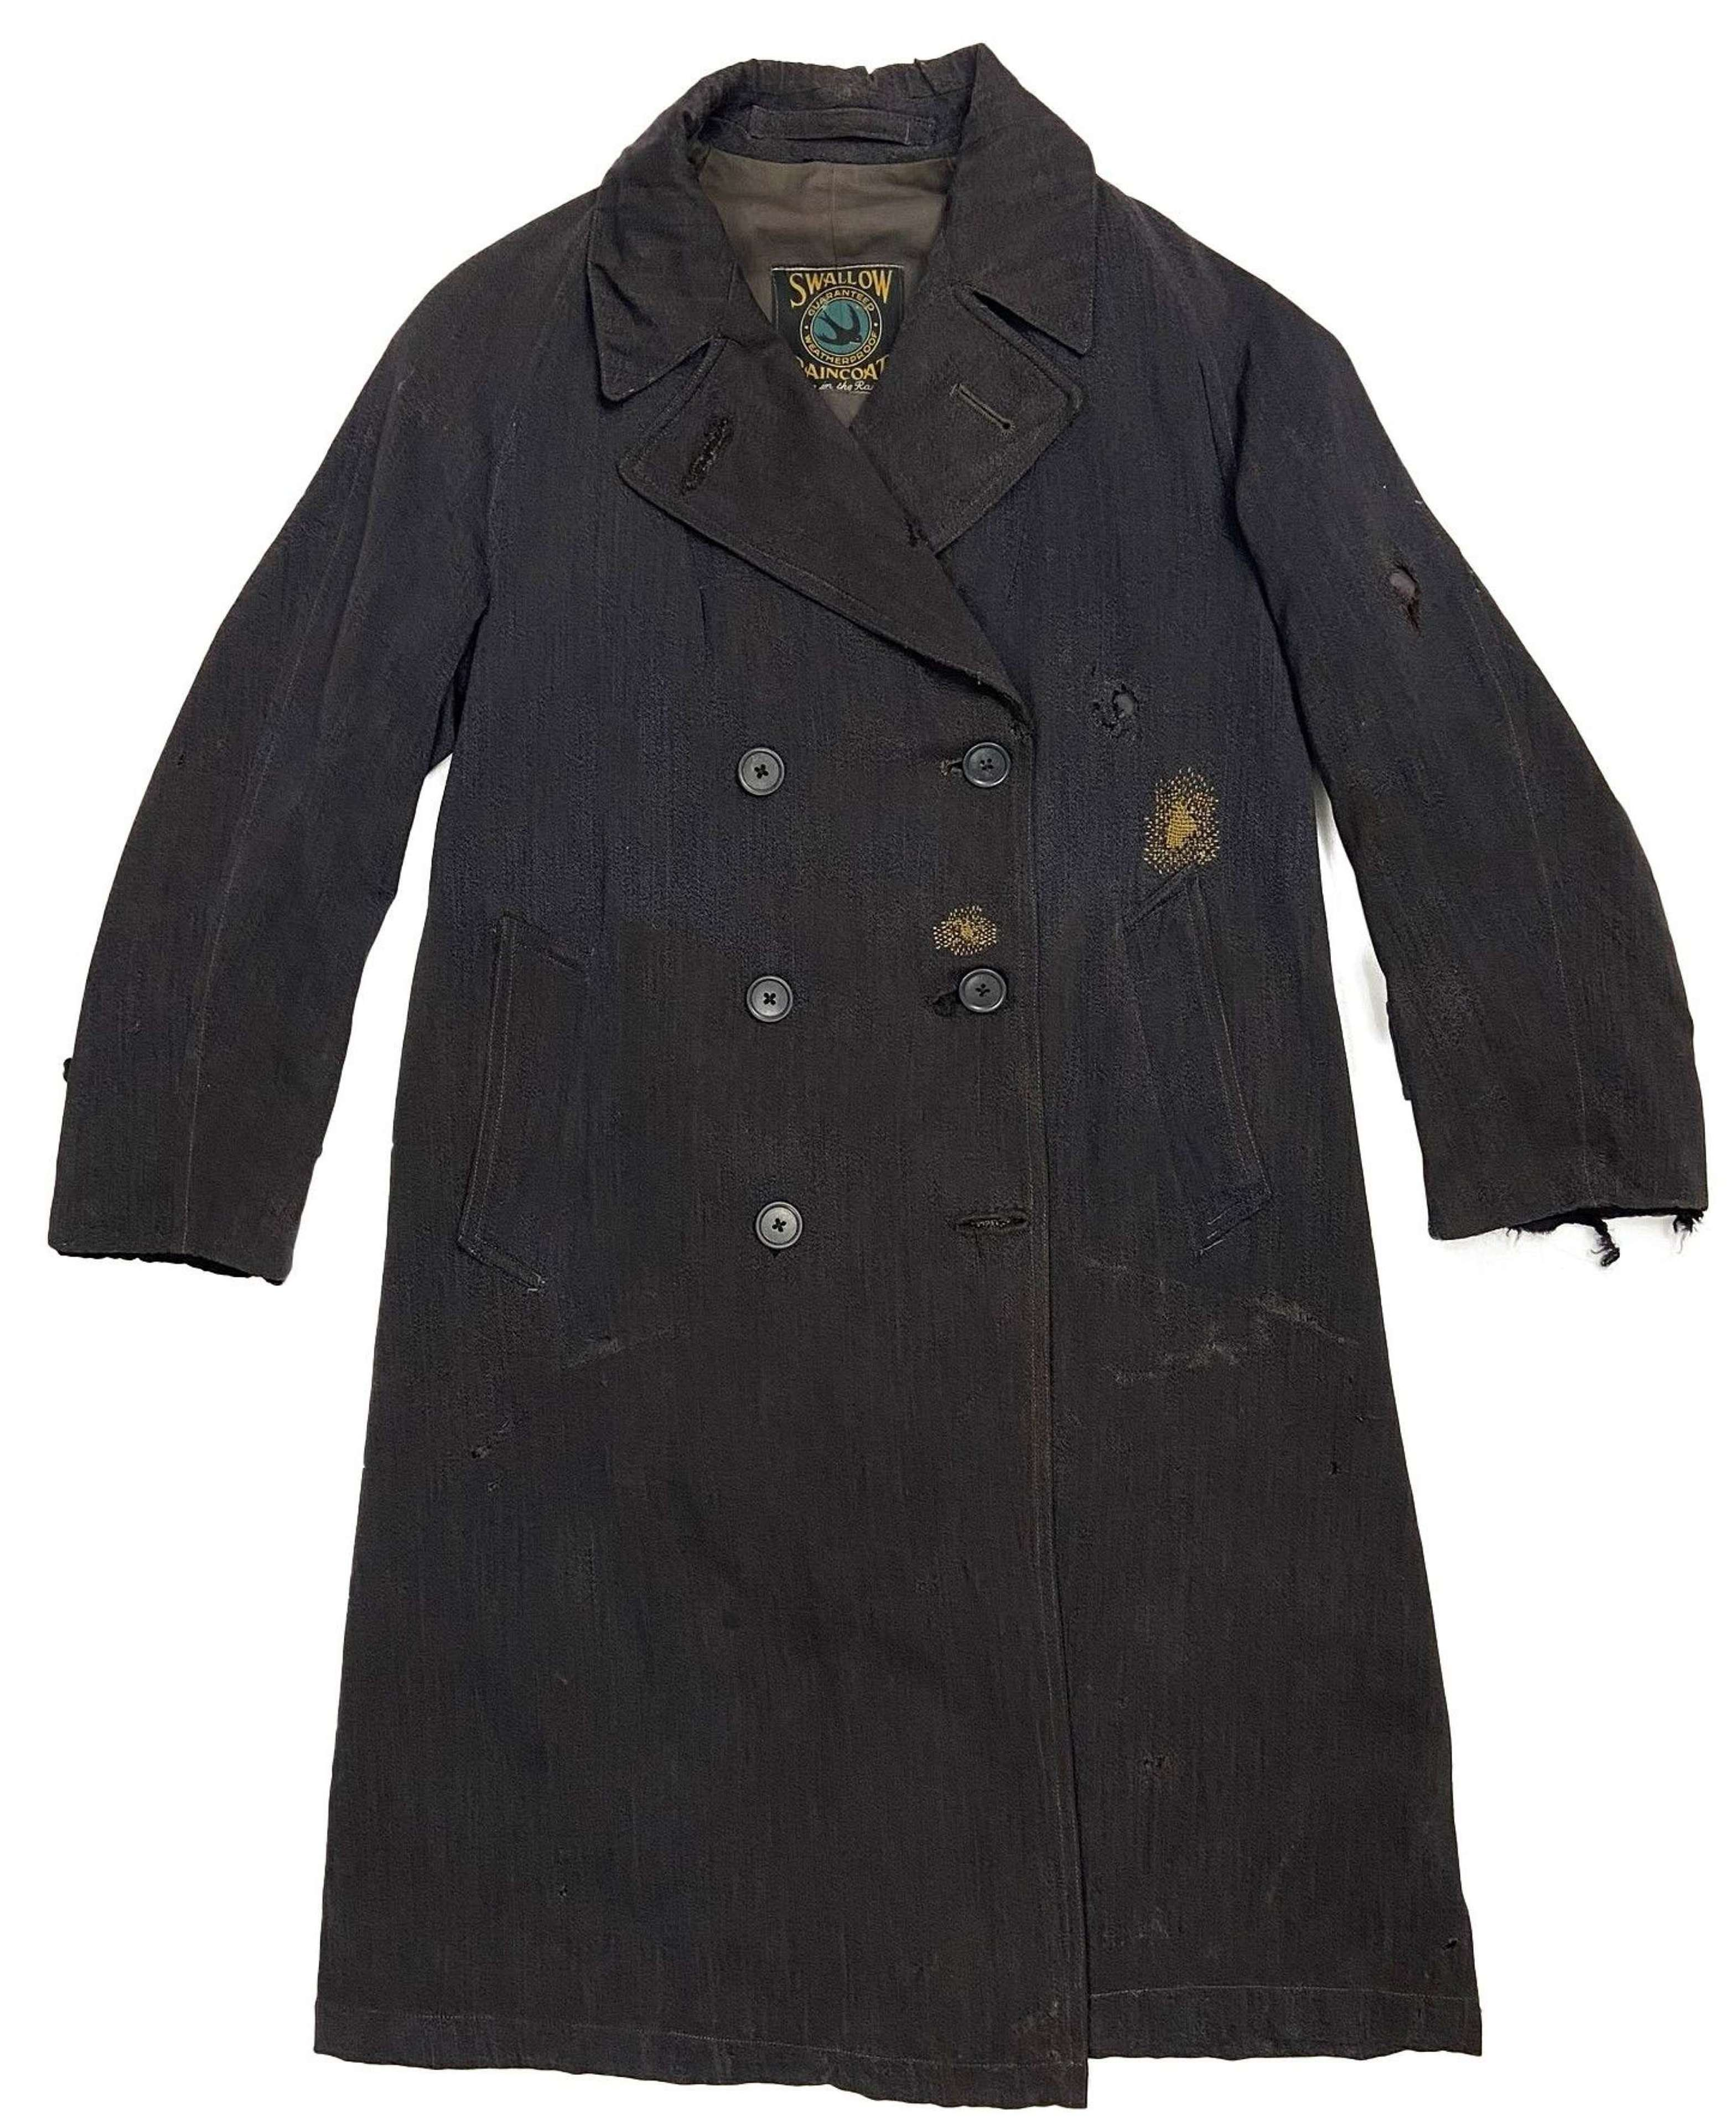 Original 1943 Dated Women's Civil Defence Gabardine Raincoat - Size 1